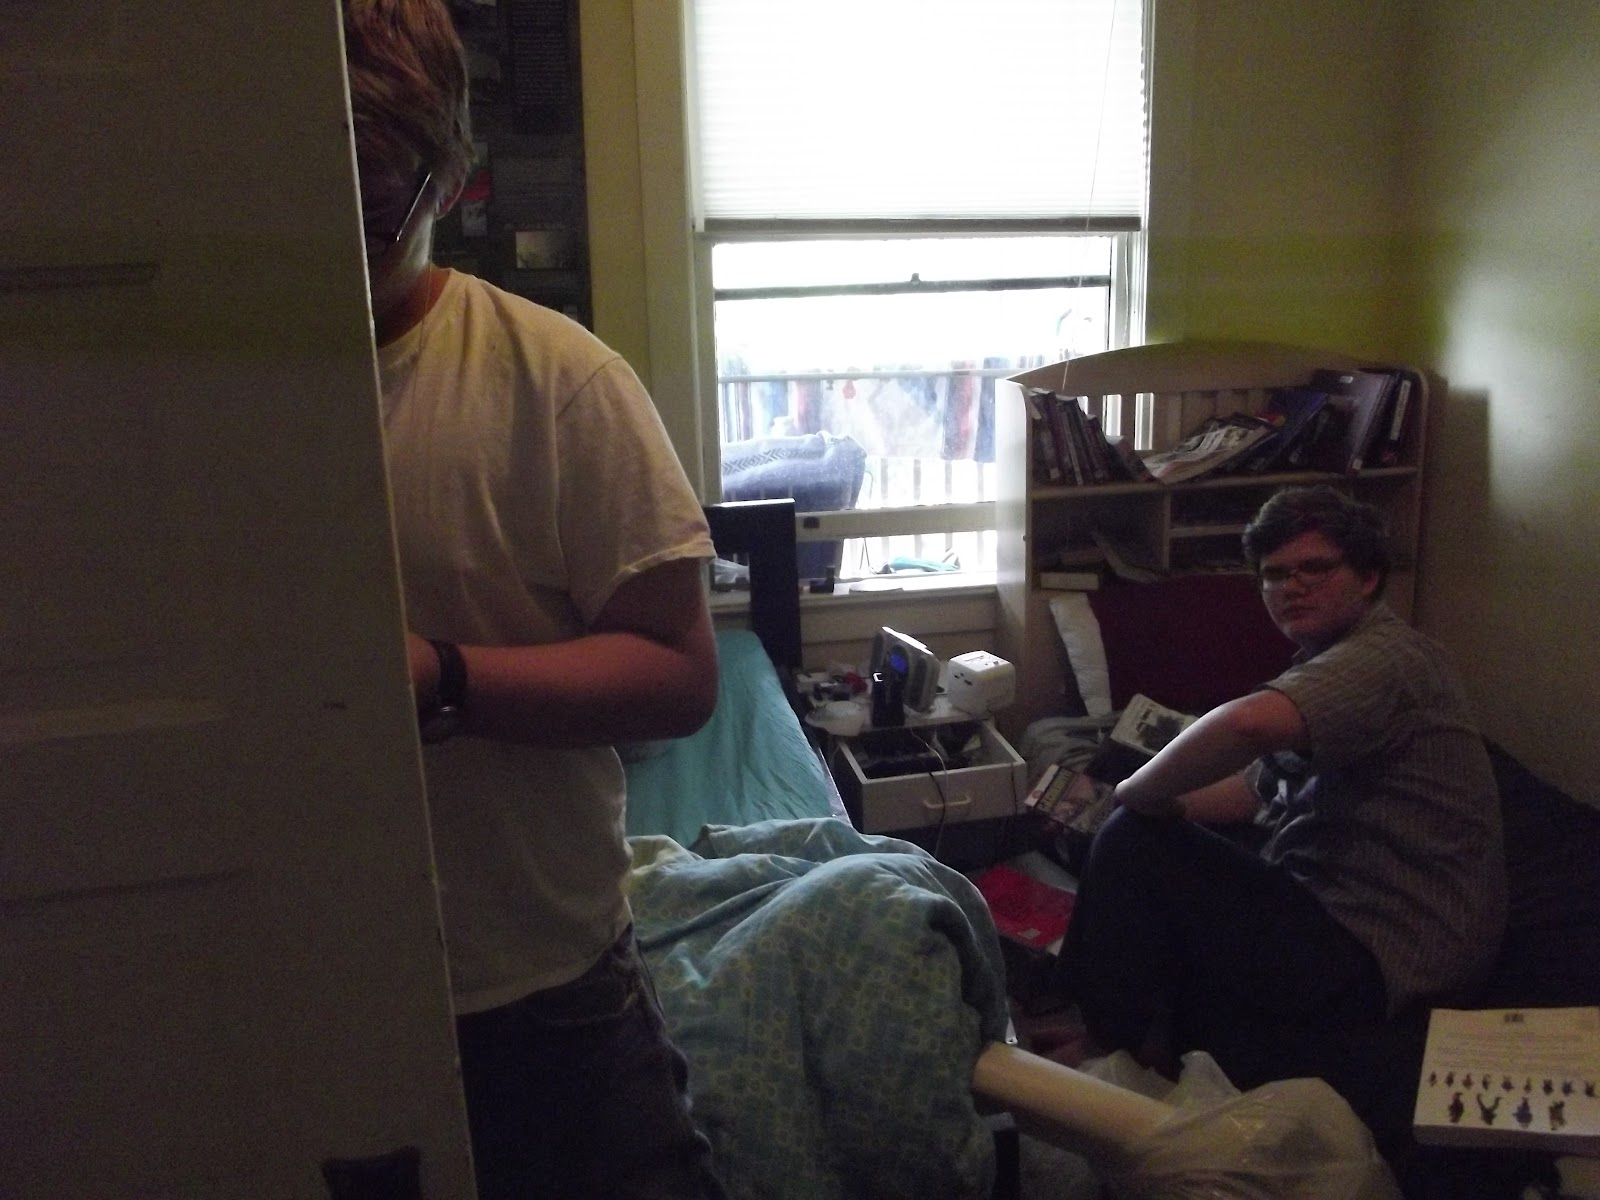 2 teenage boys decluttering a room